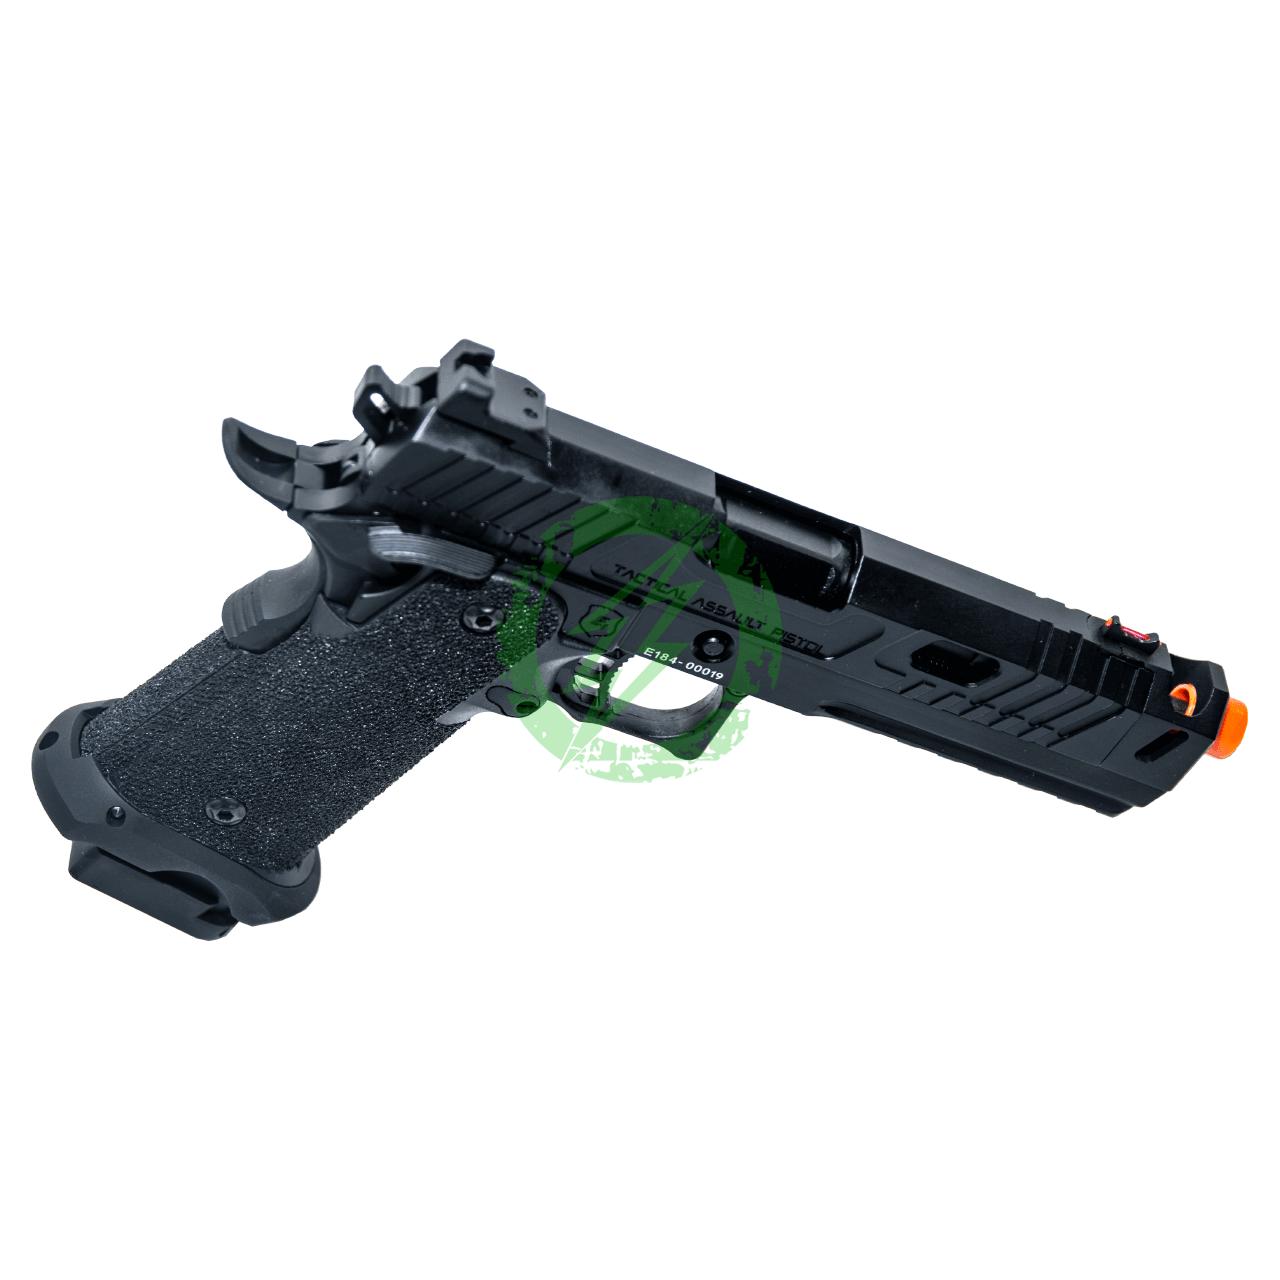 ECHO 1 TAP Gas Blow Back Pistol | Black right